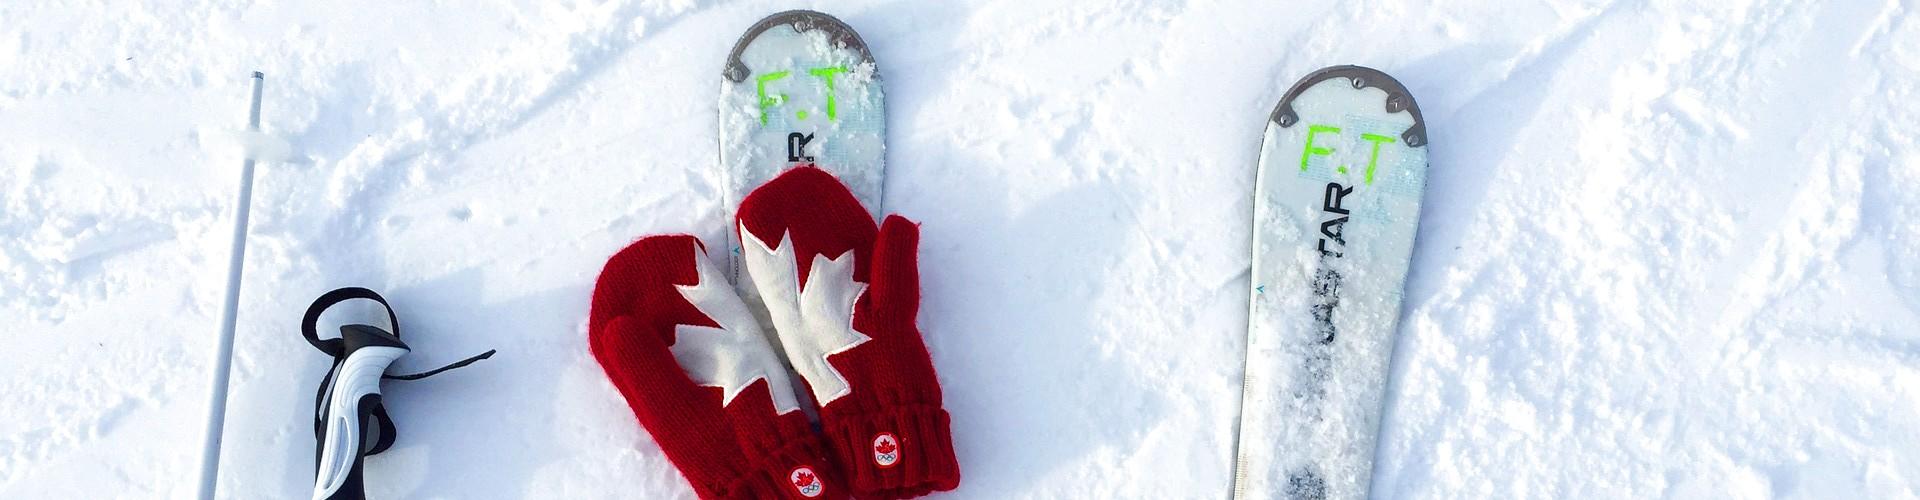 Reisetipps zum Thema: Kanada